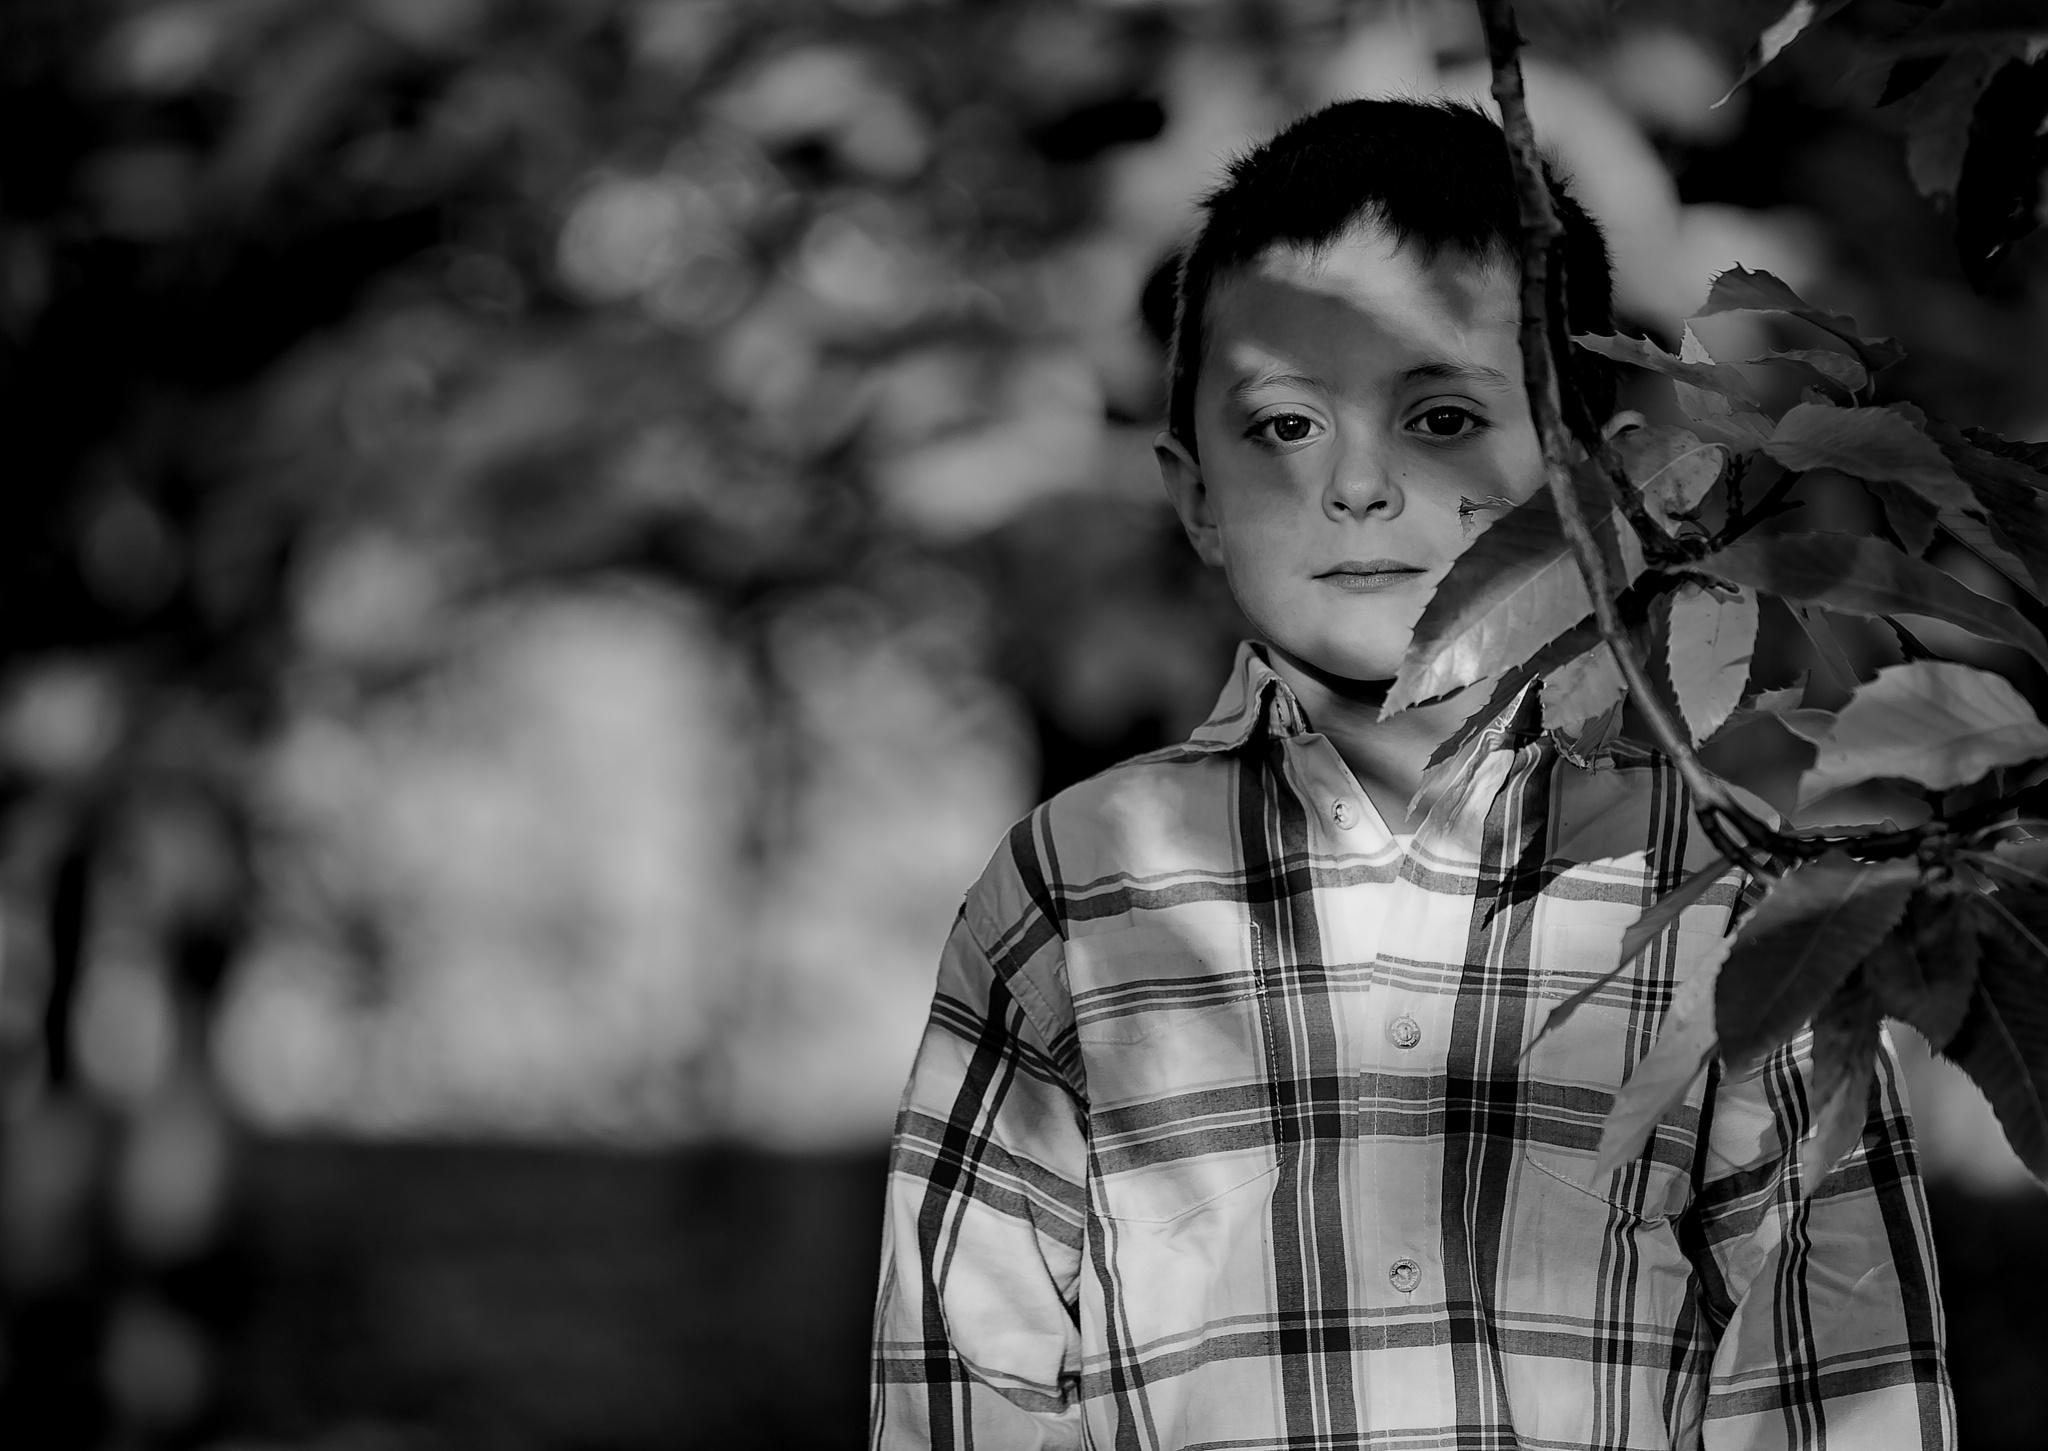 Tommi 2015© by fabio.forneris